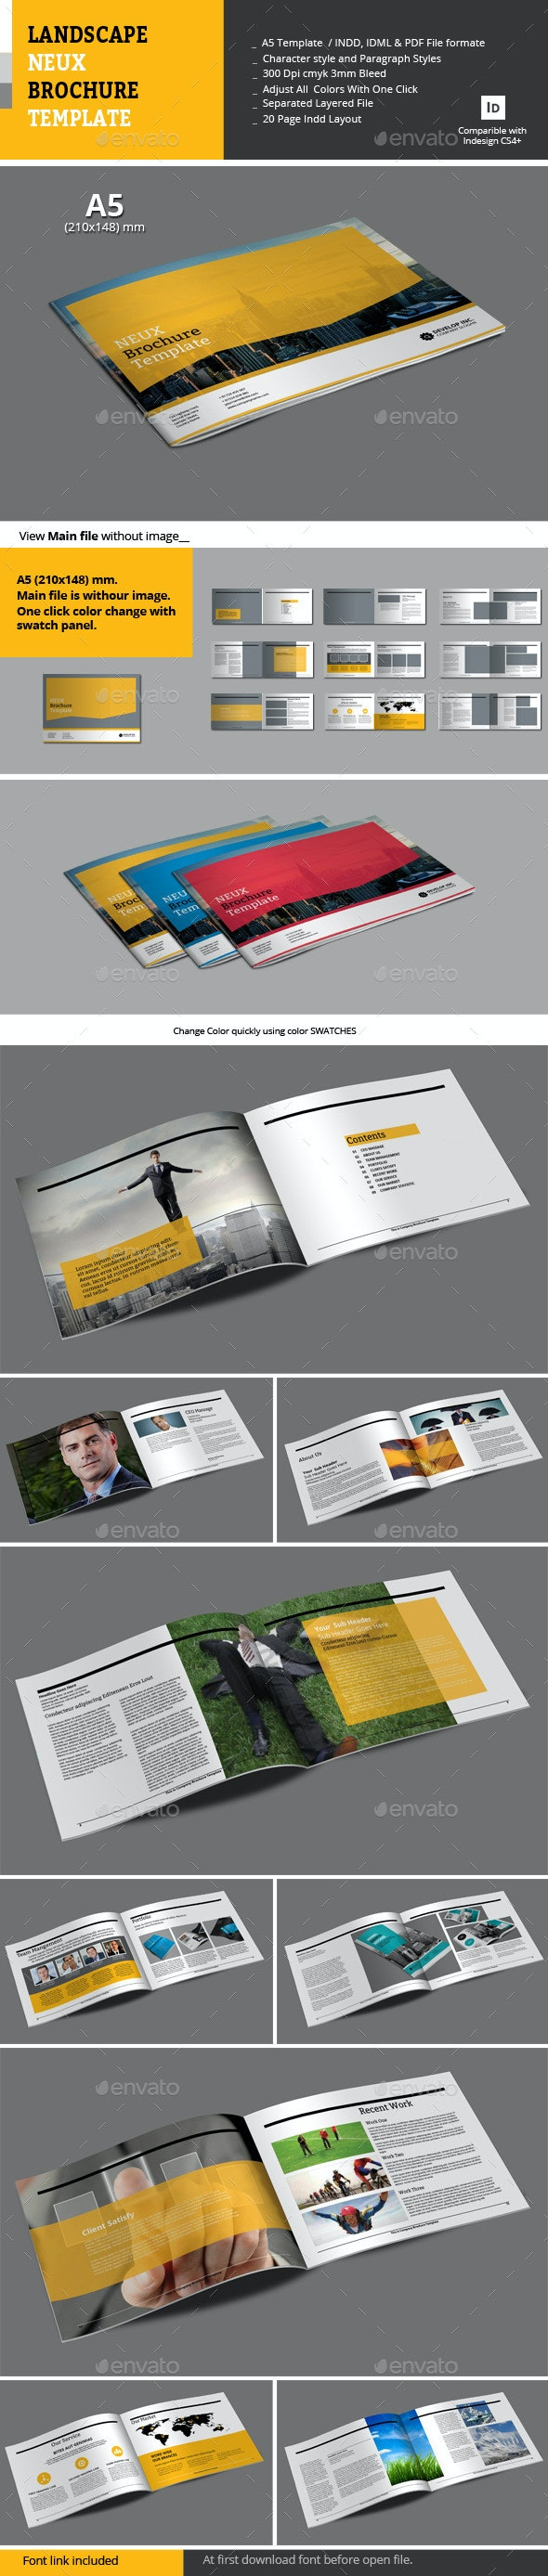 Landscape Neux Brochure Template - Corporate Brochures